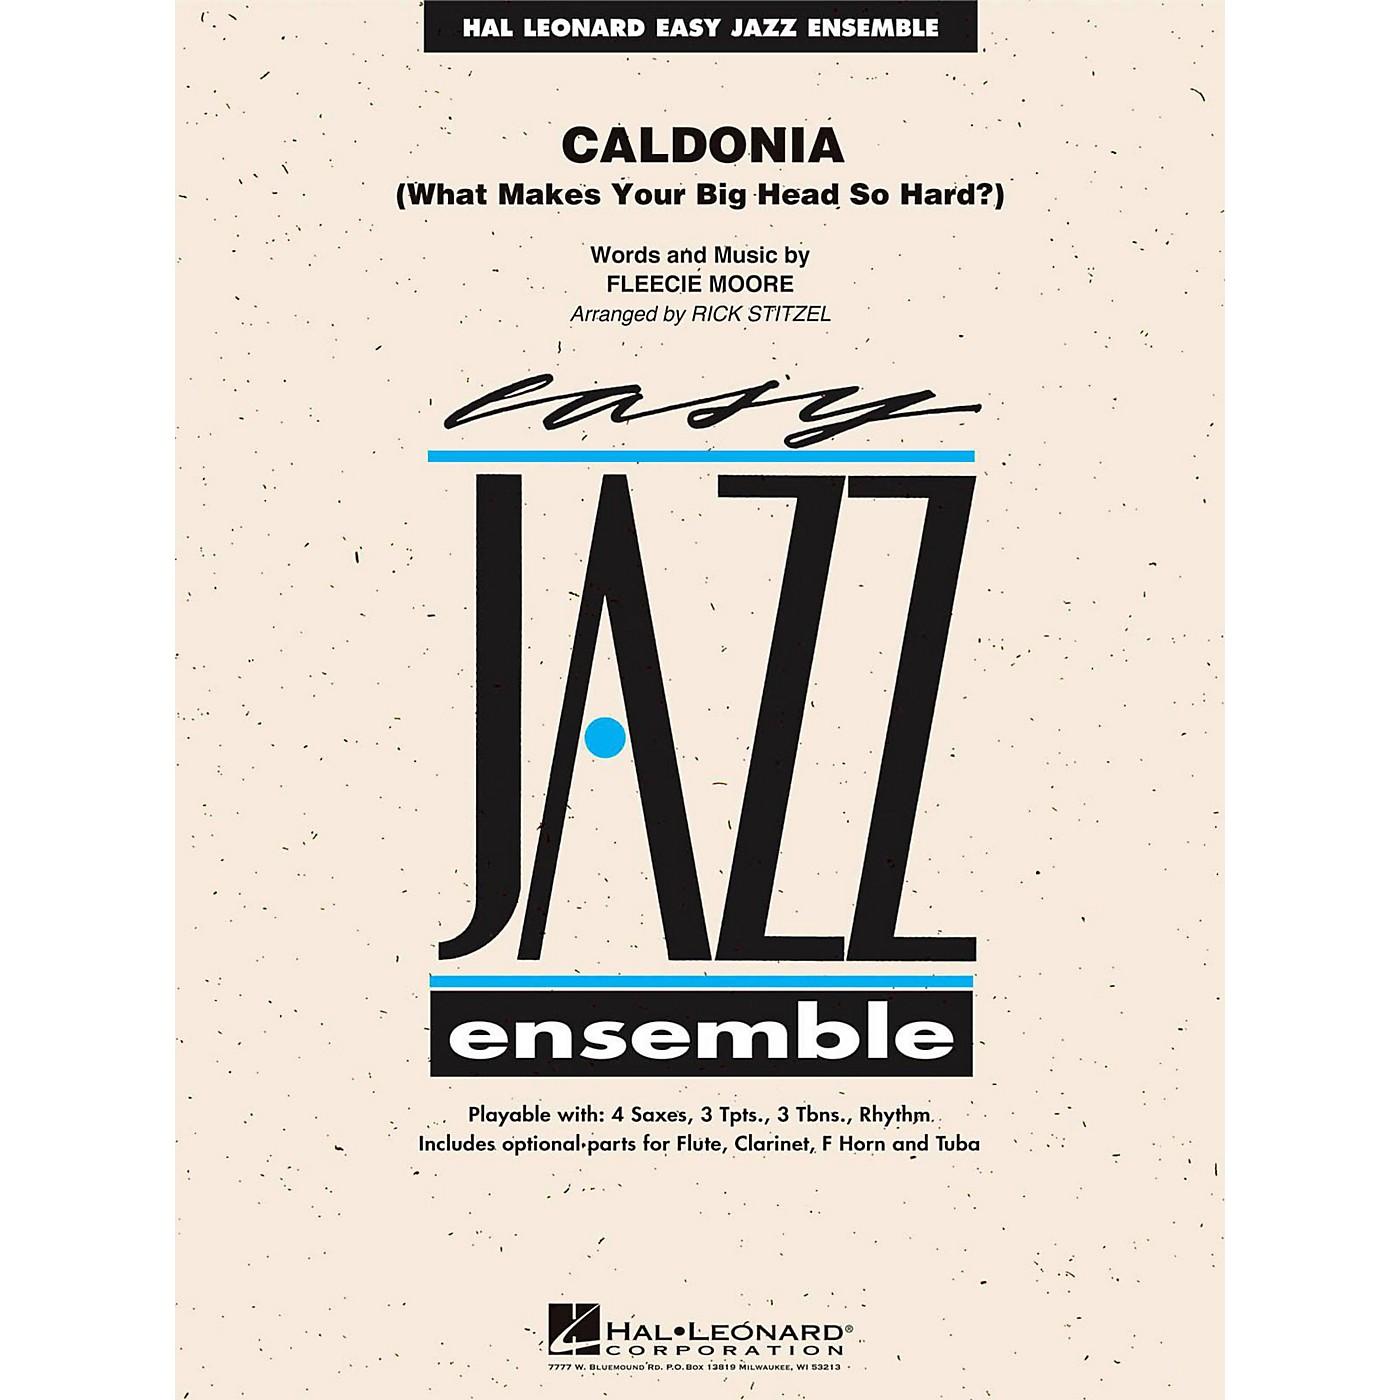 Hal Leonard Caldonia - Easy Jazz Ensemble Series Level 2 thumbnail